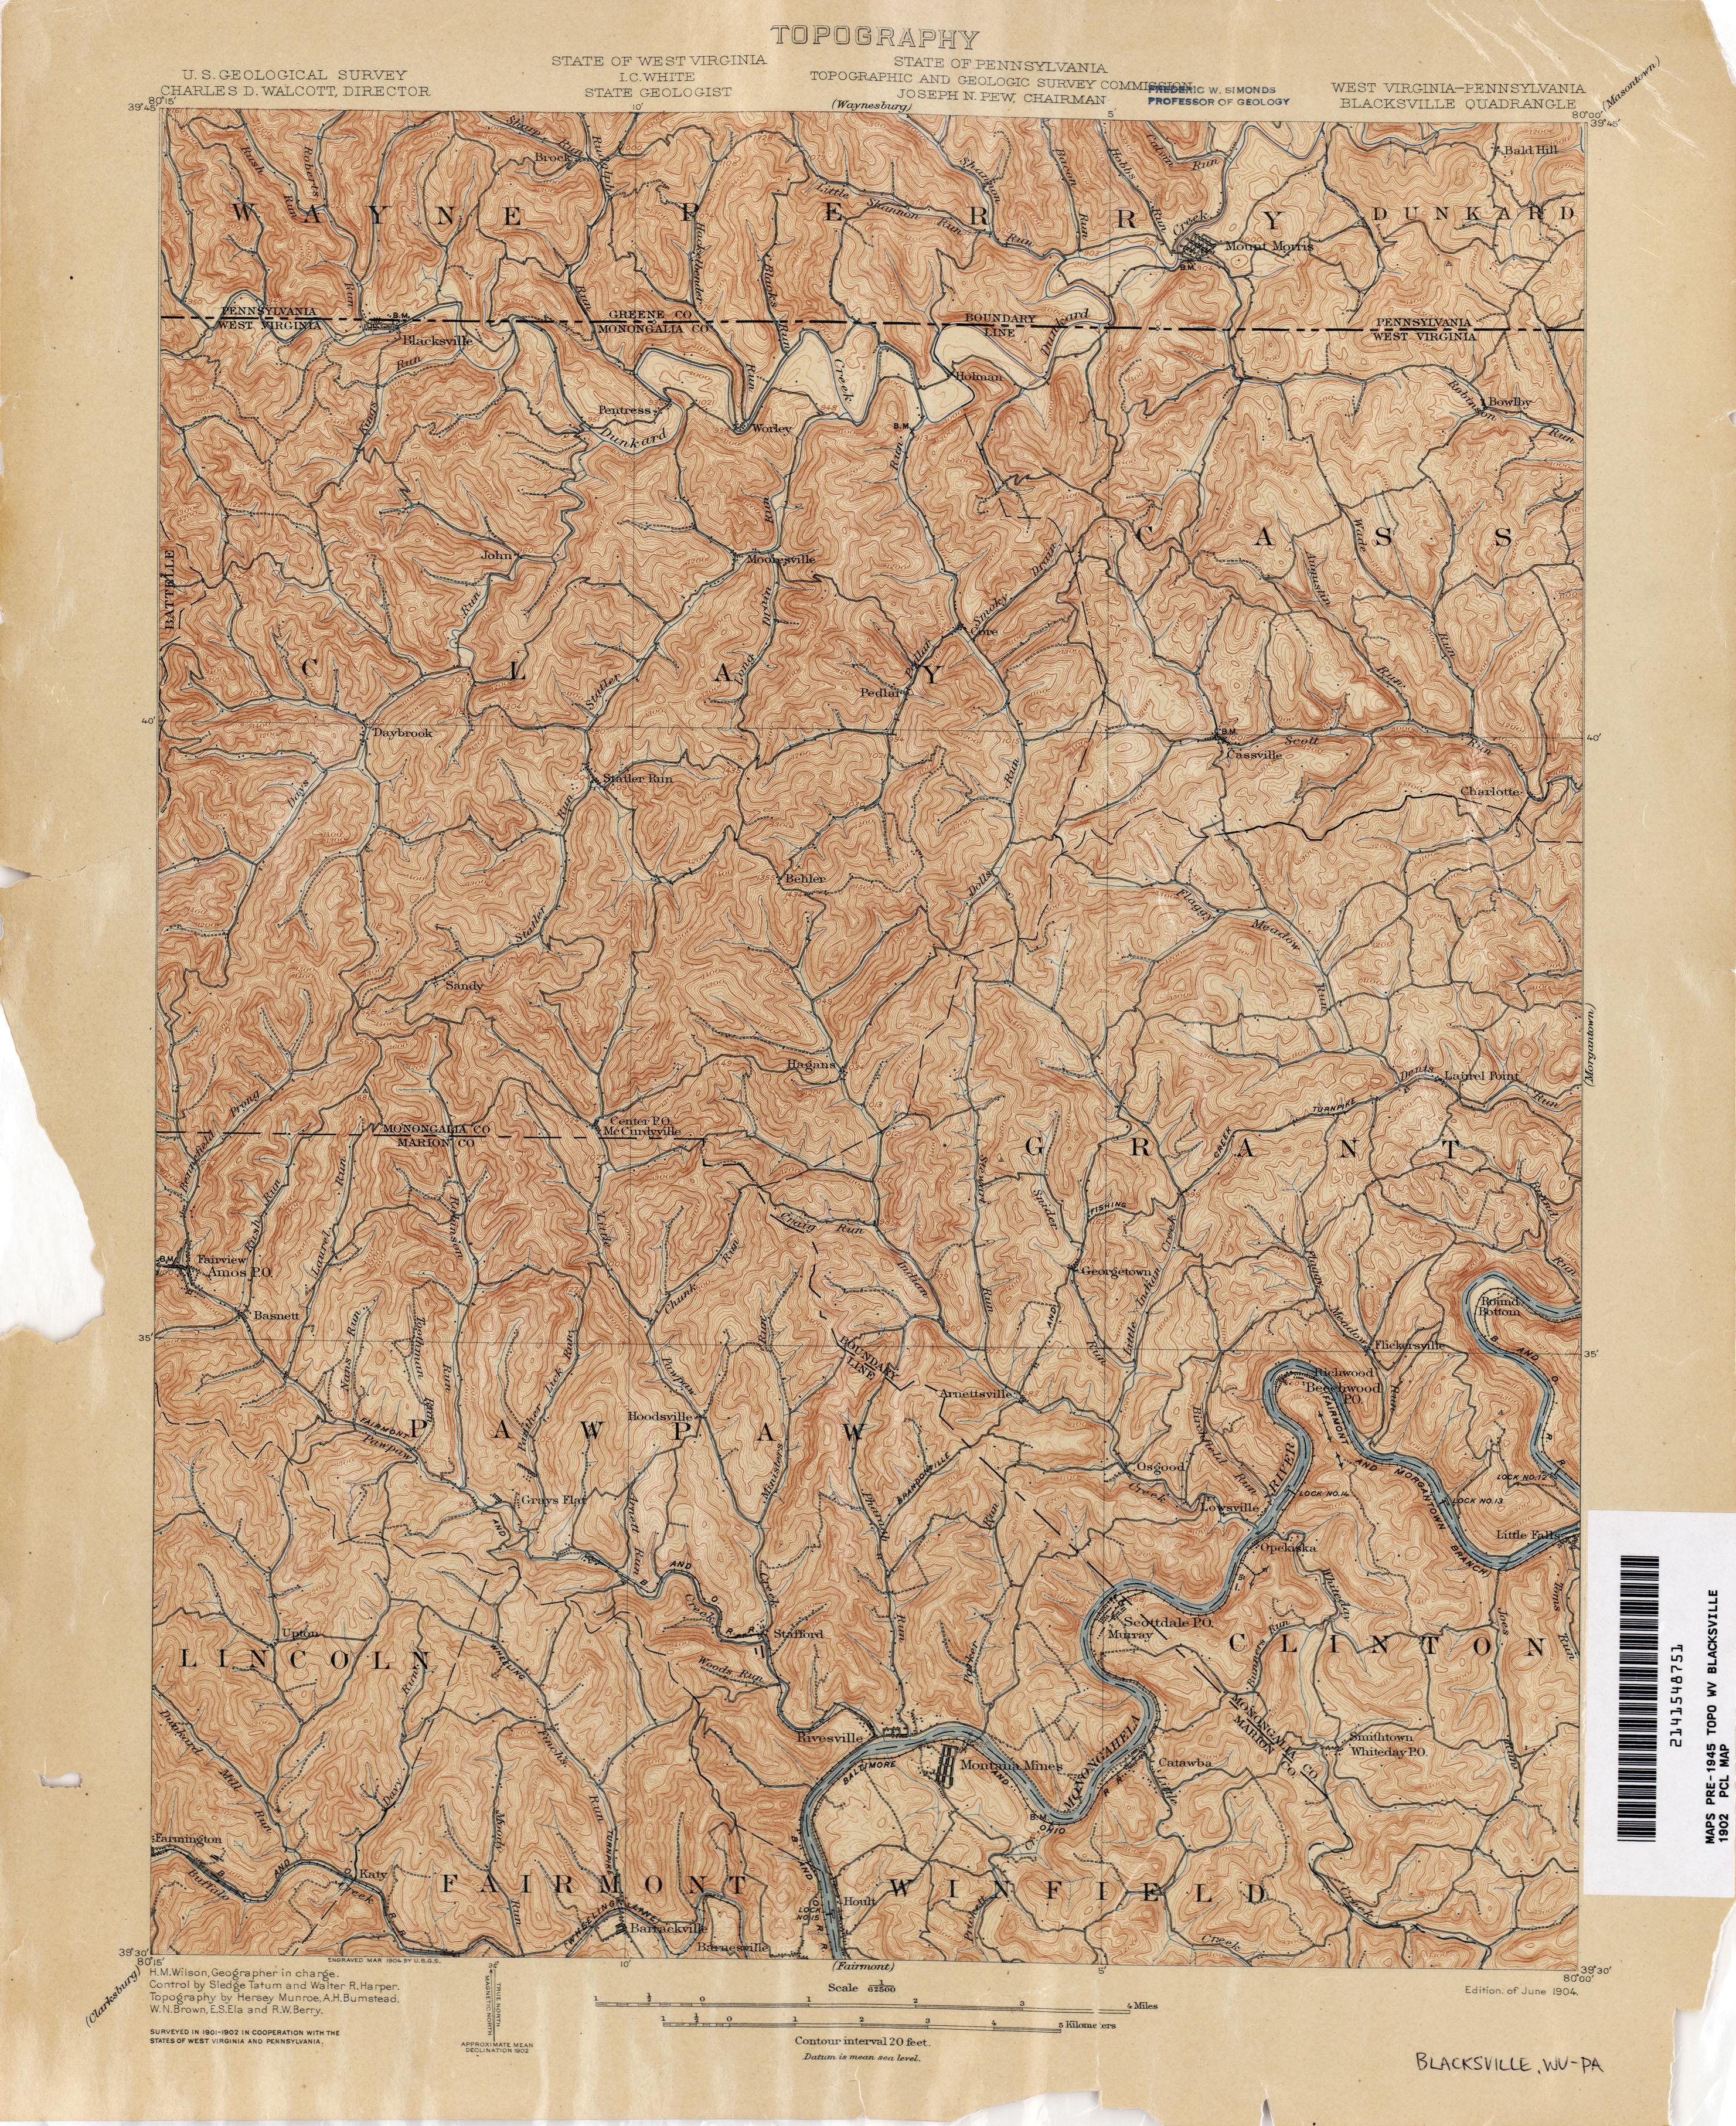 Meade Proctor Pinegrove Antique Littleton West Virginia 1905 US Geological Survey Topographic Map \u2013 Wetzel County Galmish Jacksonburg